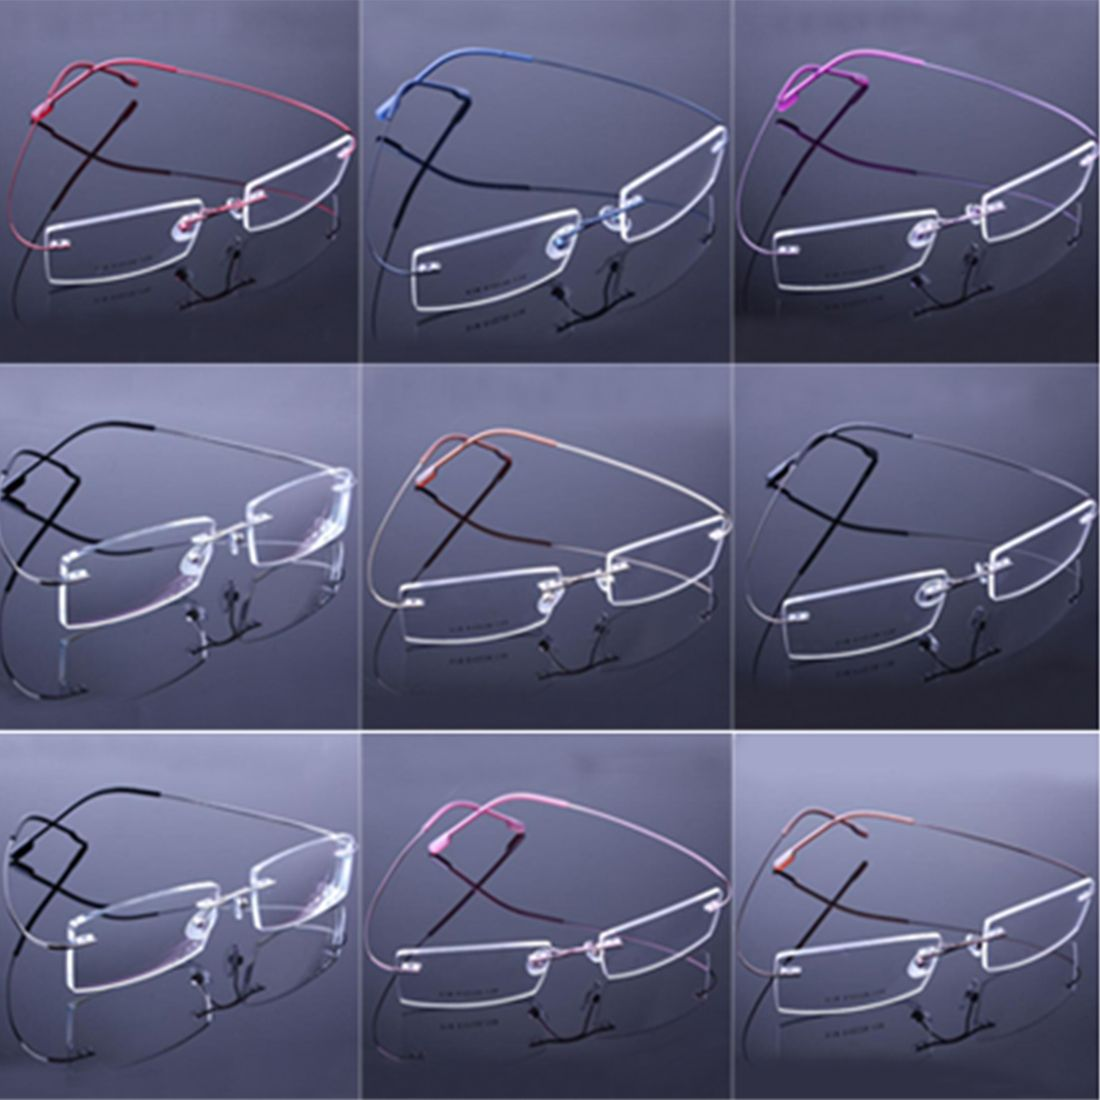 4a2eb7c5fa 9 colors Simple rimless glasses frames fashion memory titanium eyeglasses  frames prescription optical frames